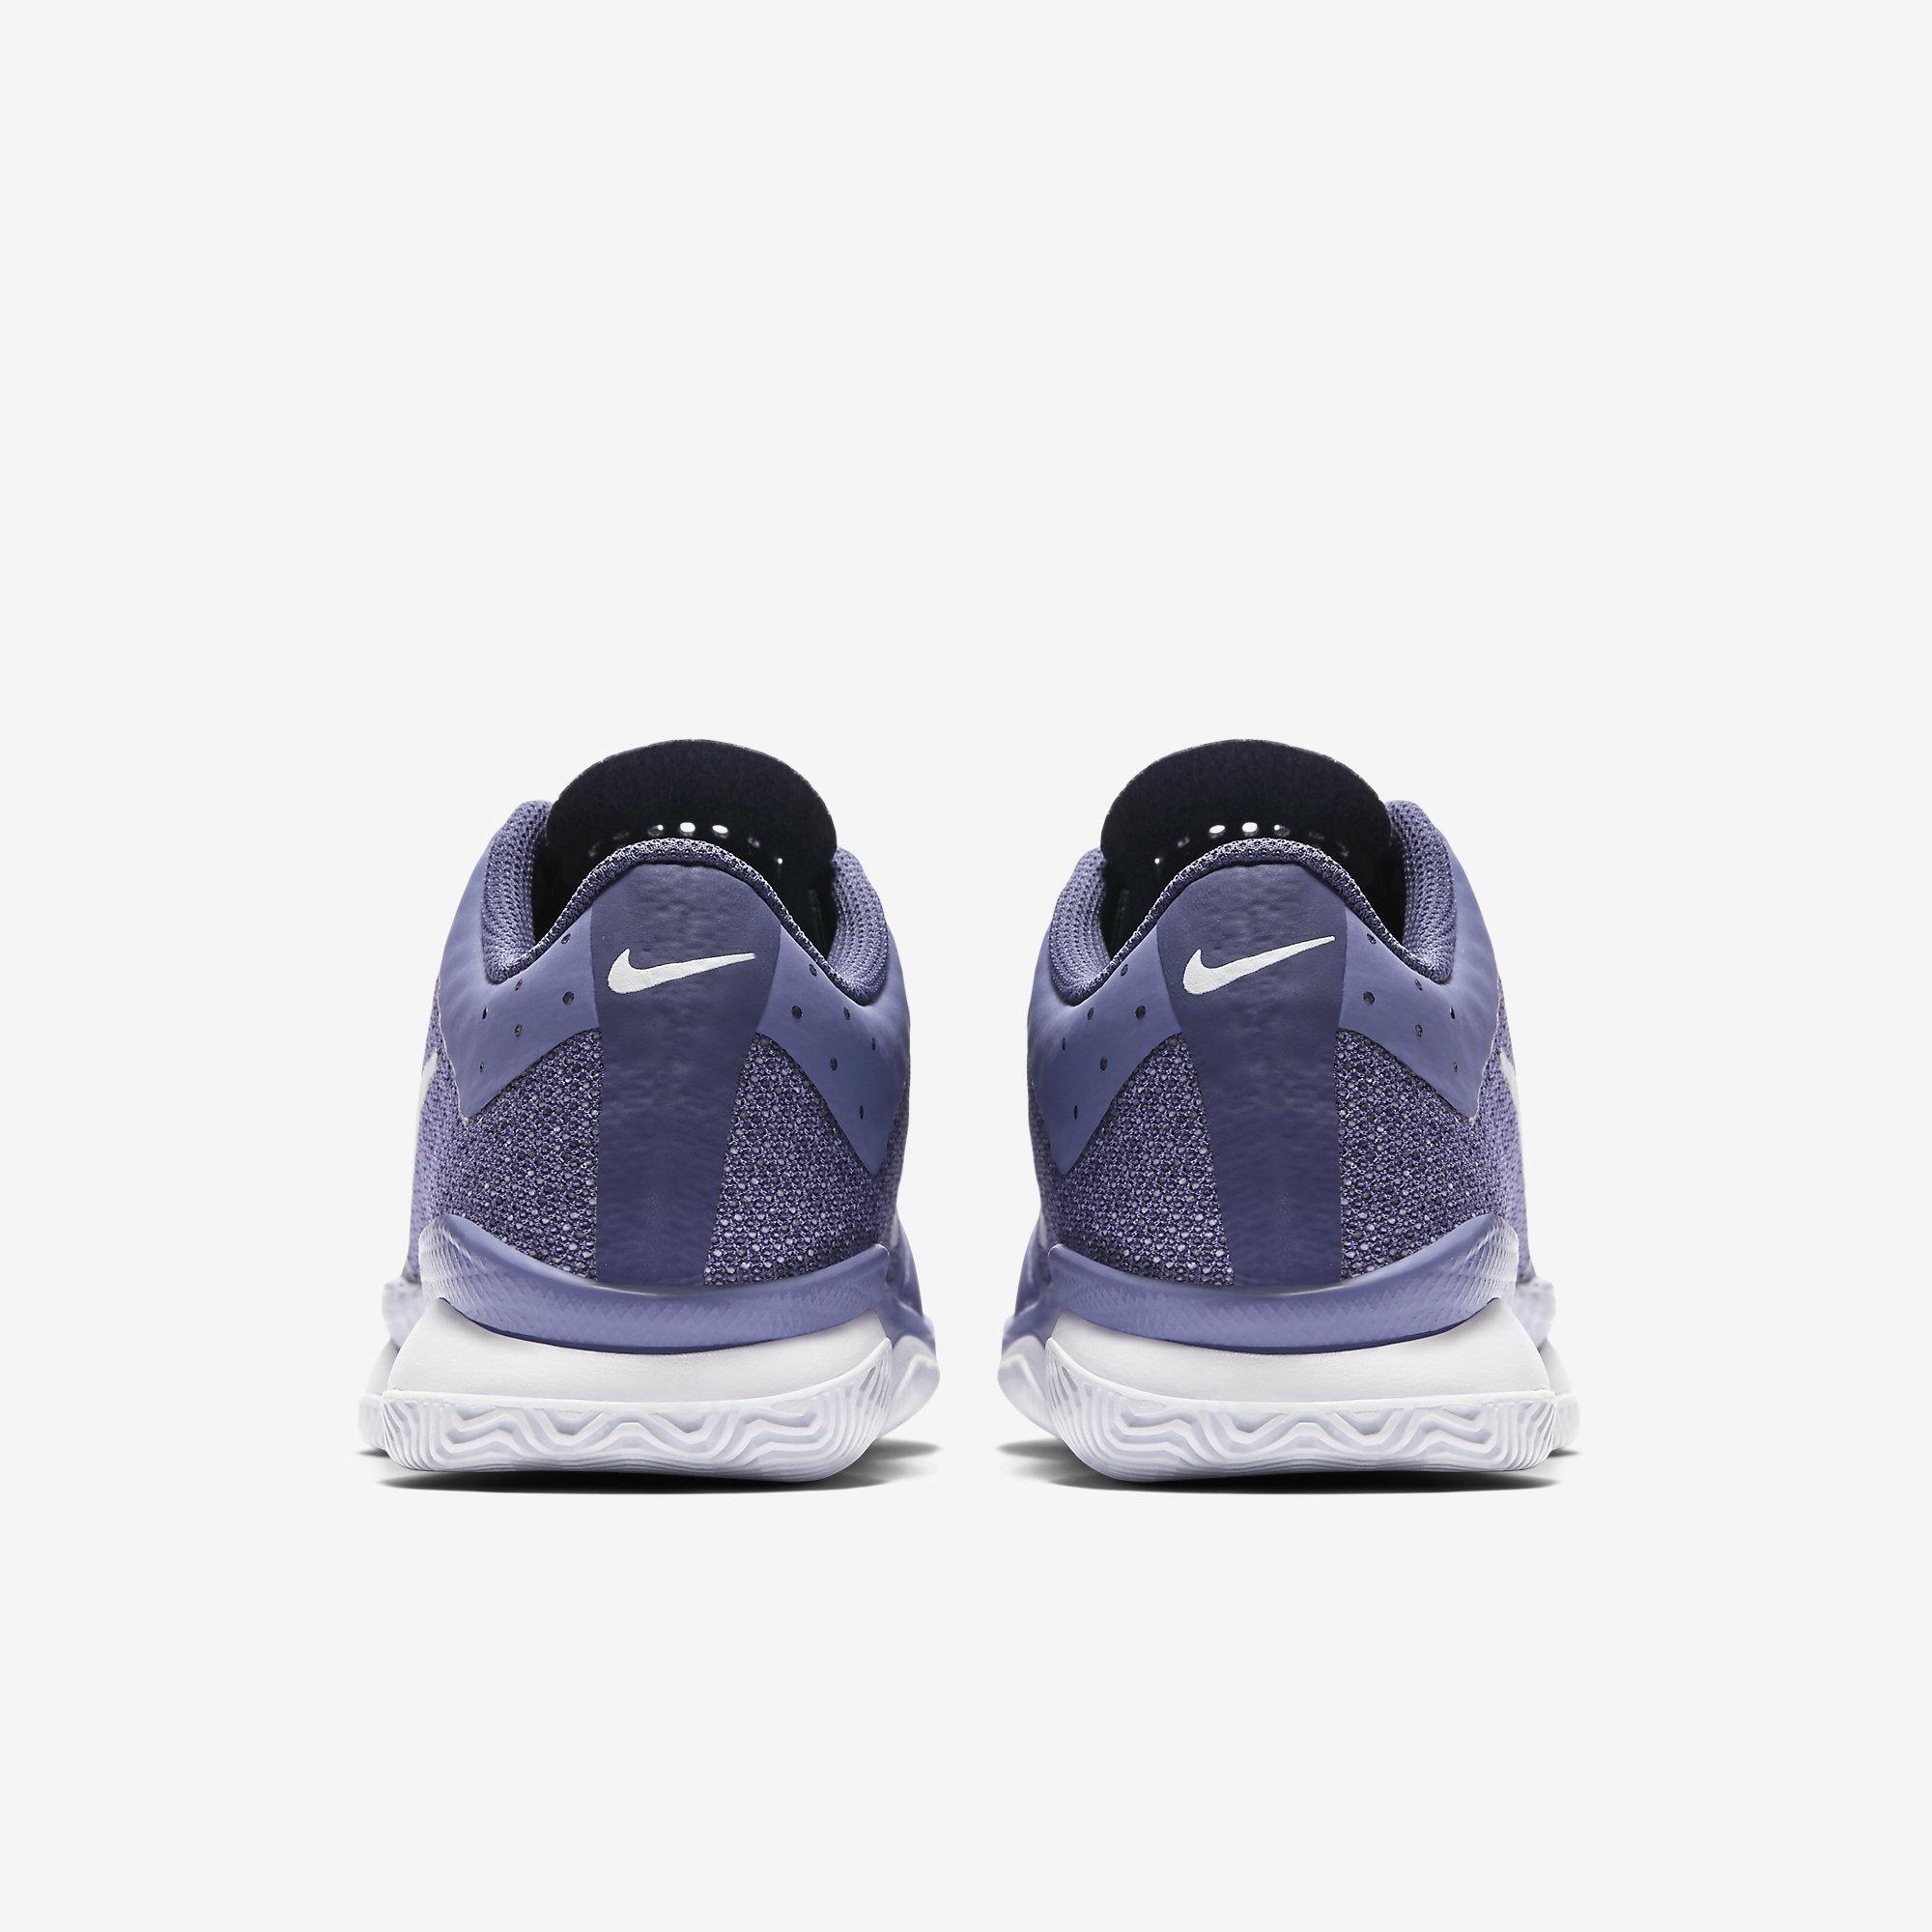 f4c595a1ed59 Nike Womens Air Zoom Ultra Tennis Shoes - Purple Slate Blue Recall White